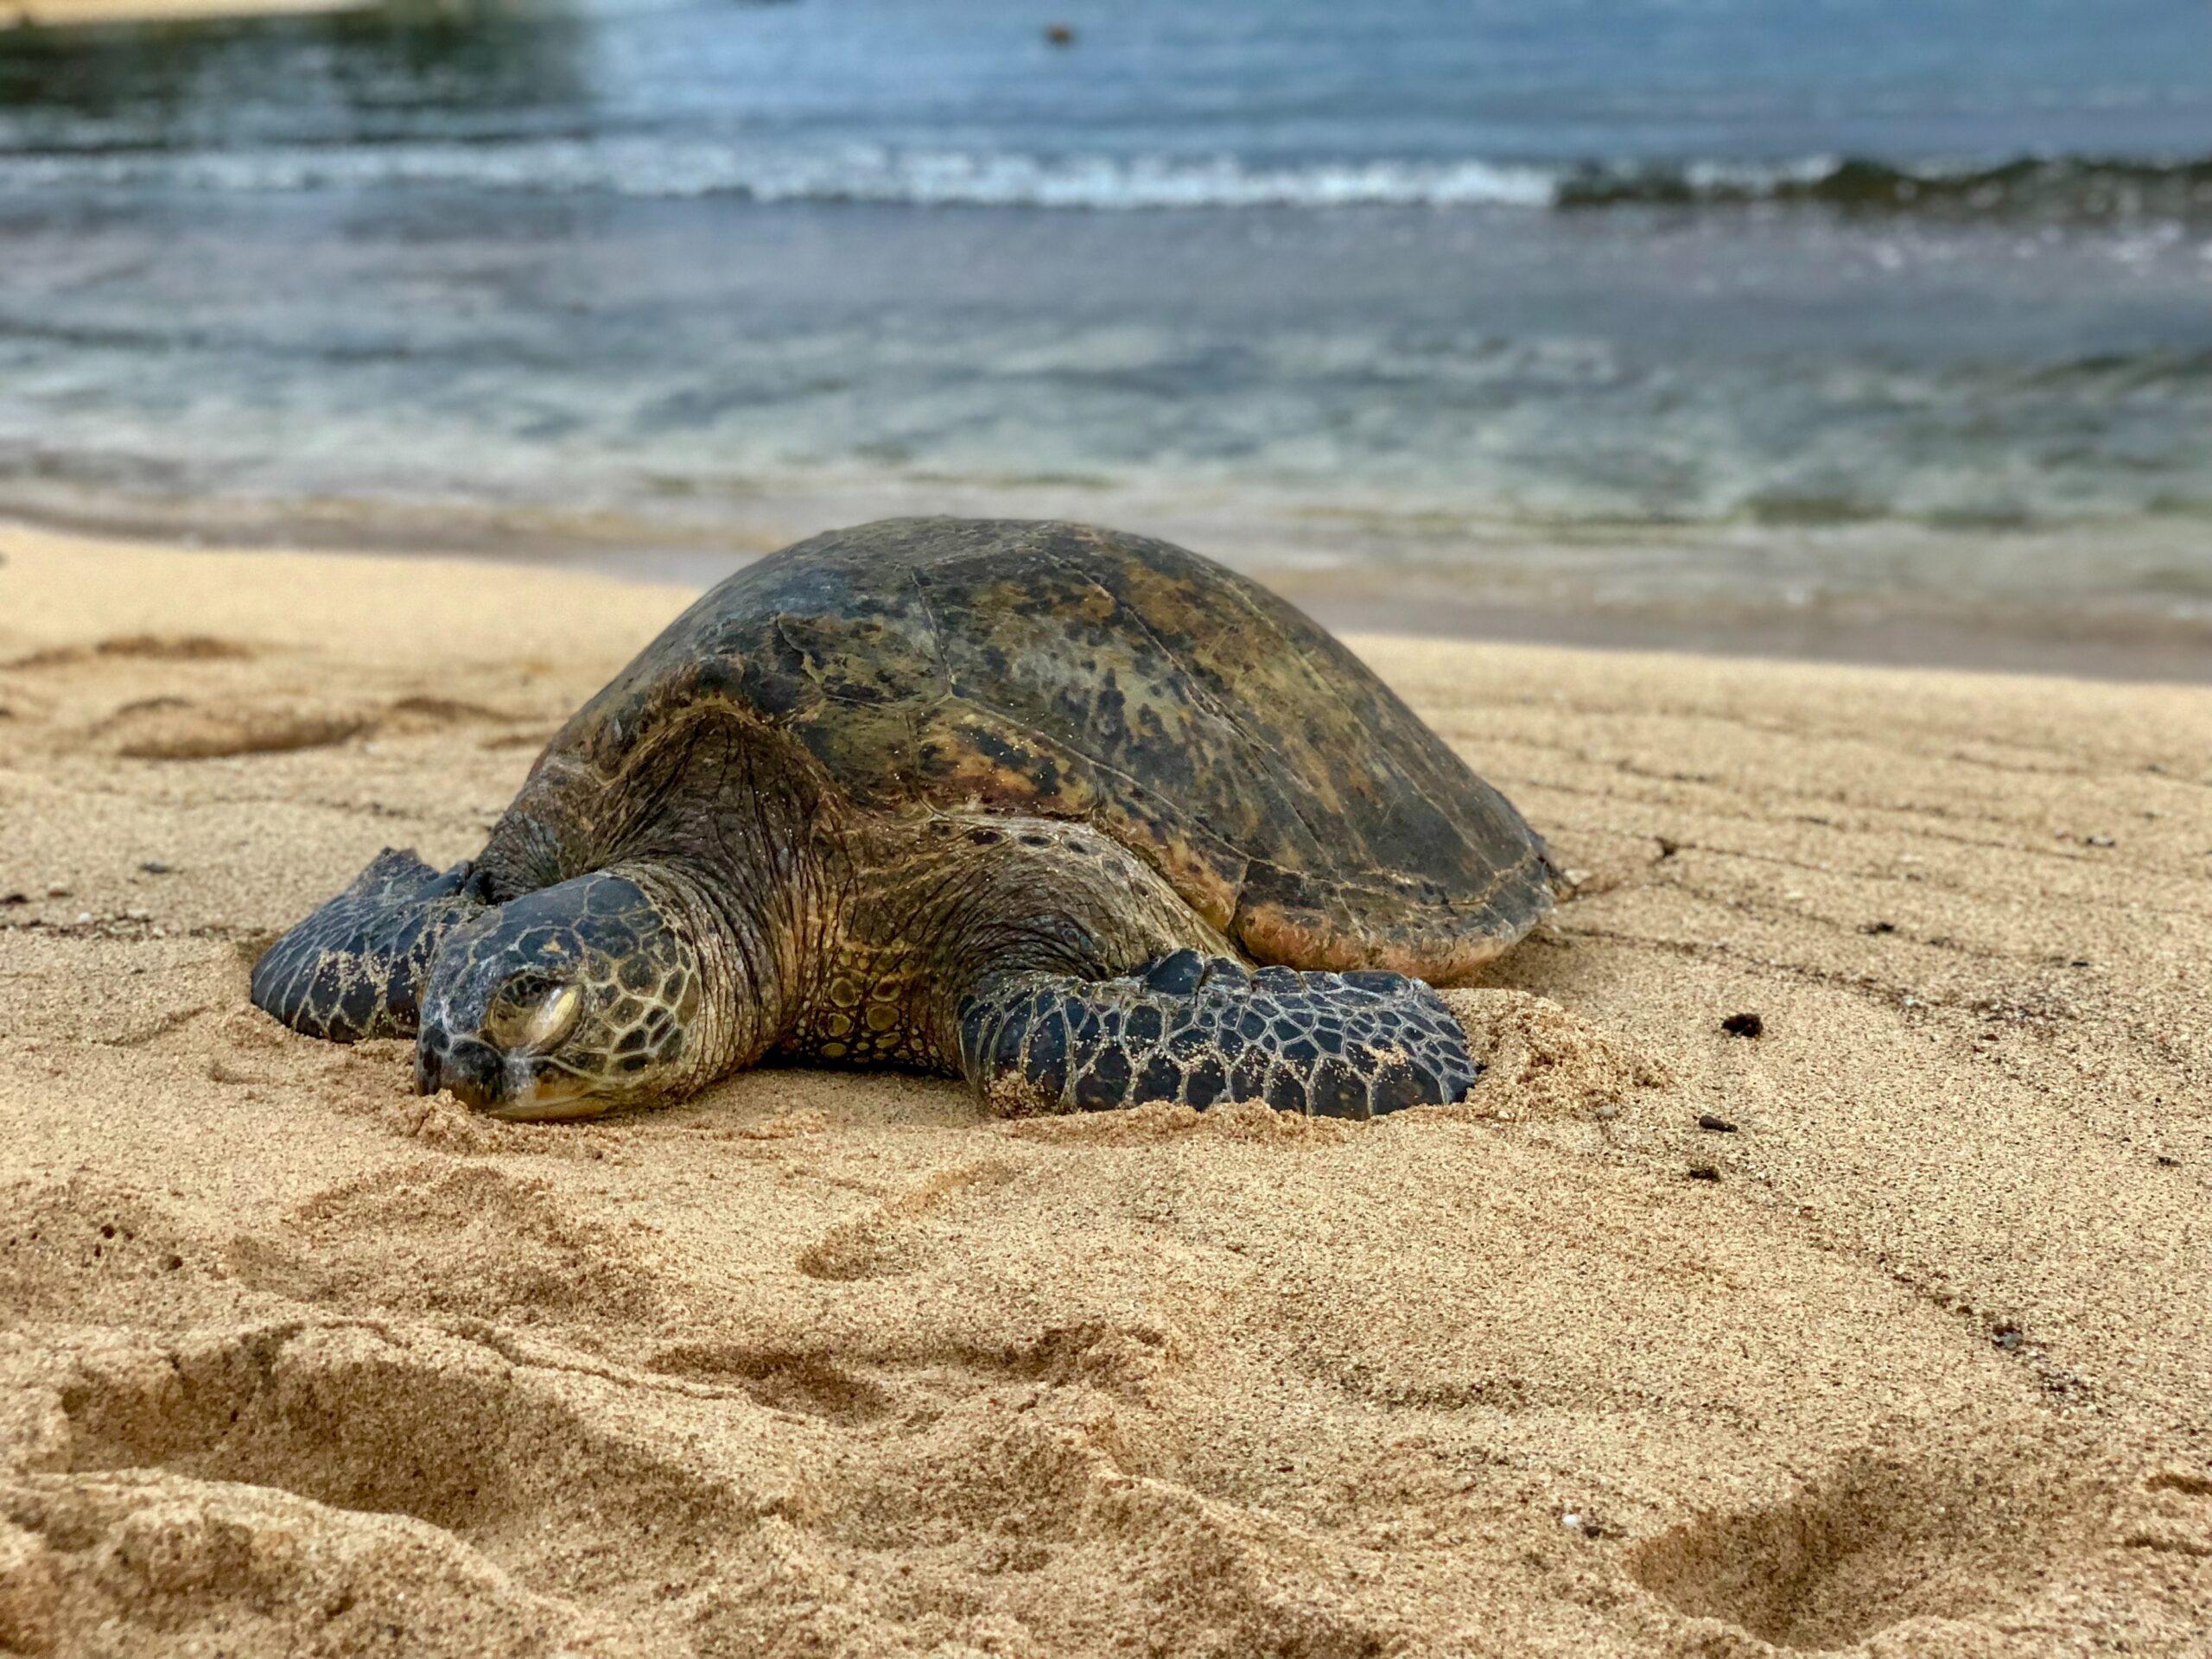 Trump Administration Sued for Failing to Protect Green Sea Turtle Habitat